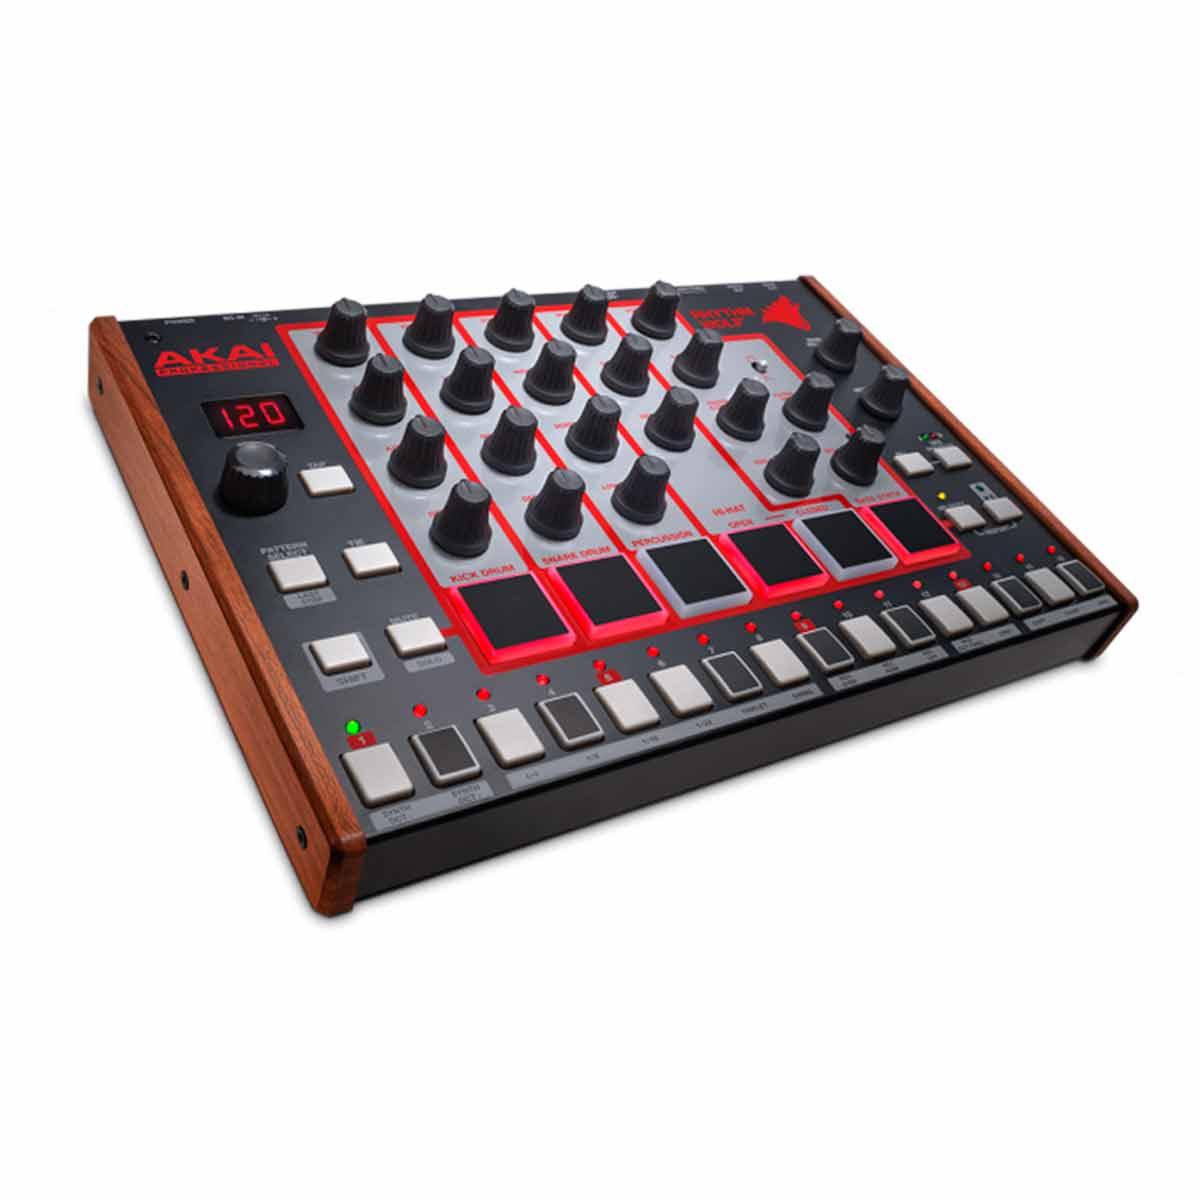 Bateria Eletrônica e Sintetizador de Baixo c/ 5 Timbres / USB / MIDI  - Rhythm Wolf AKAI